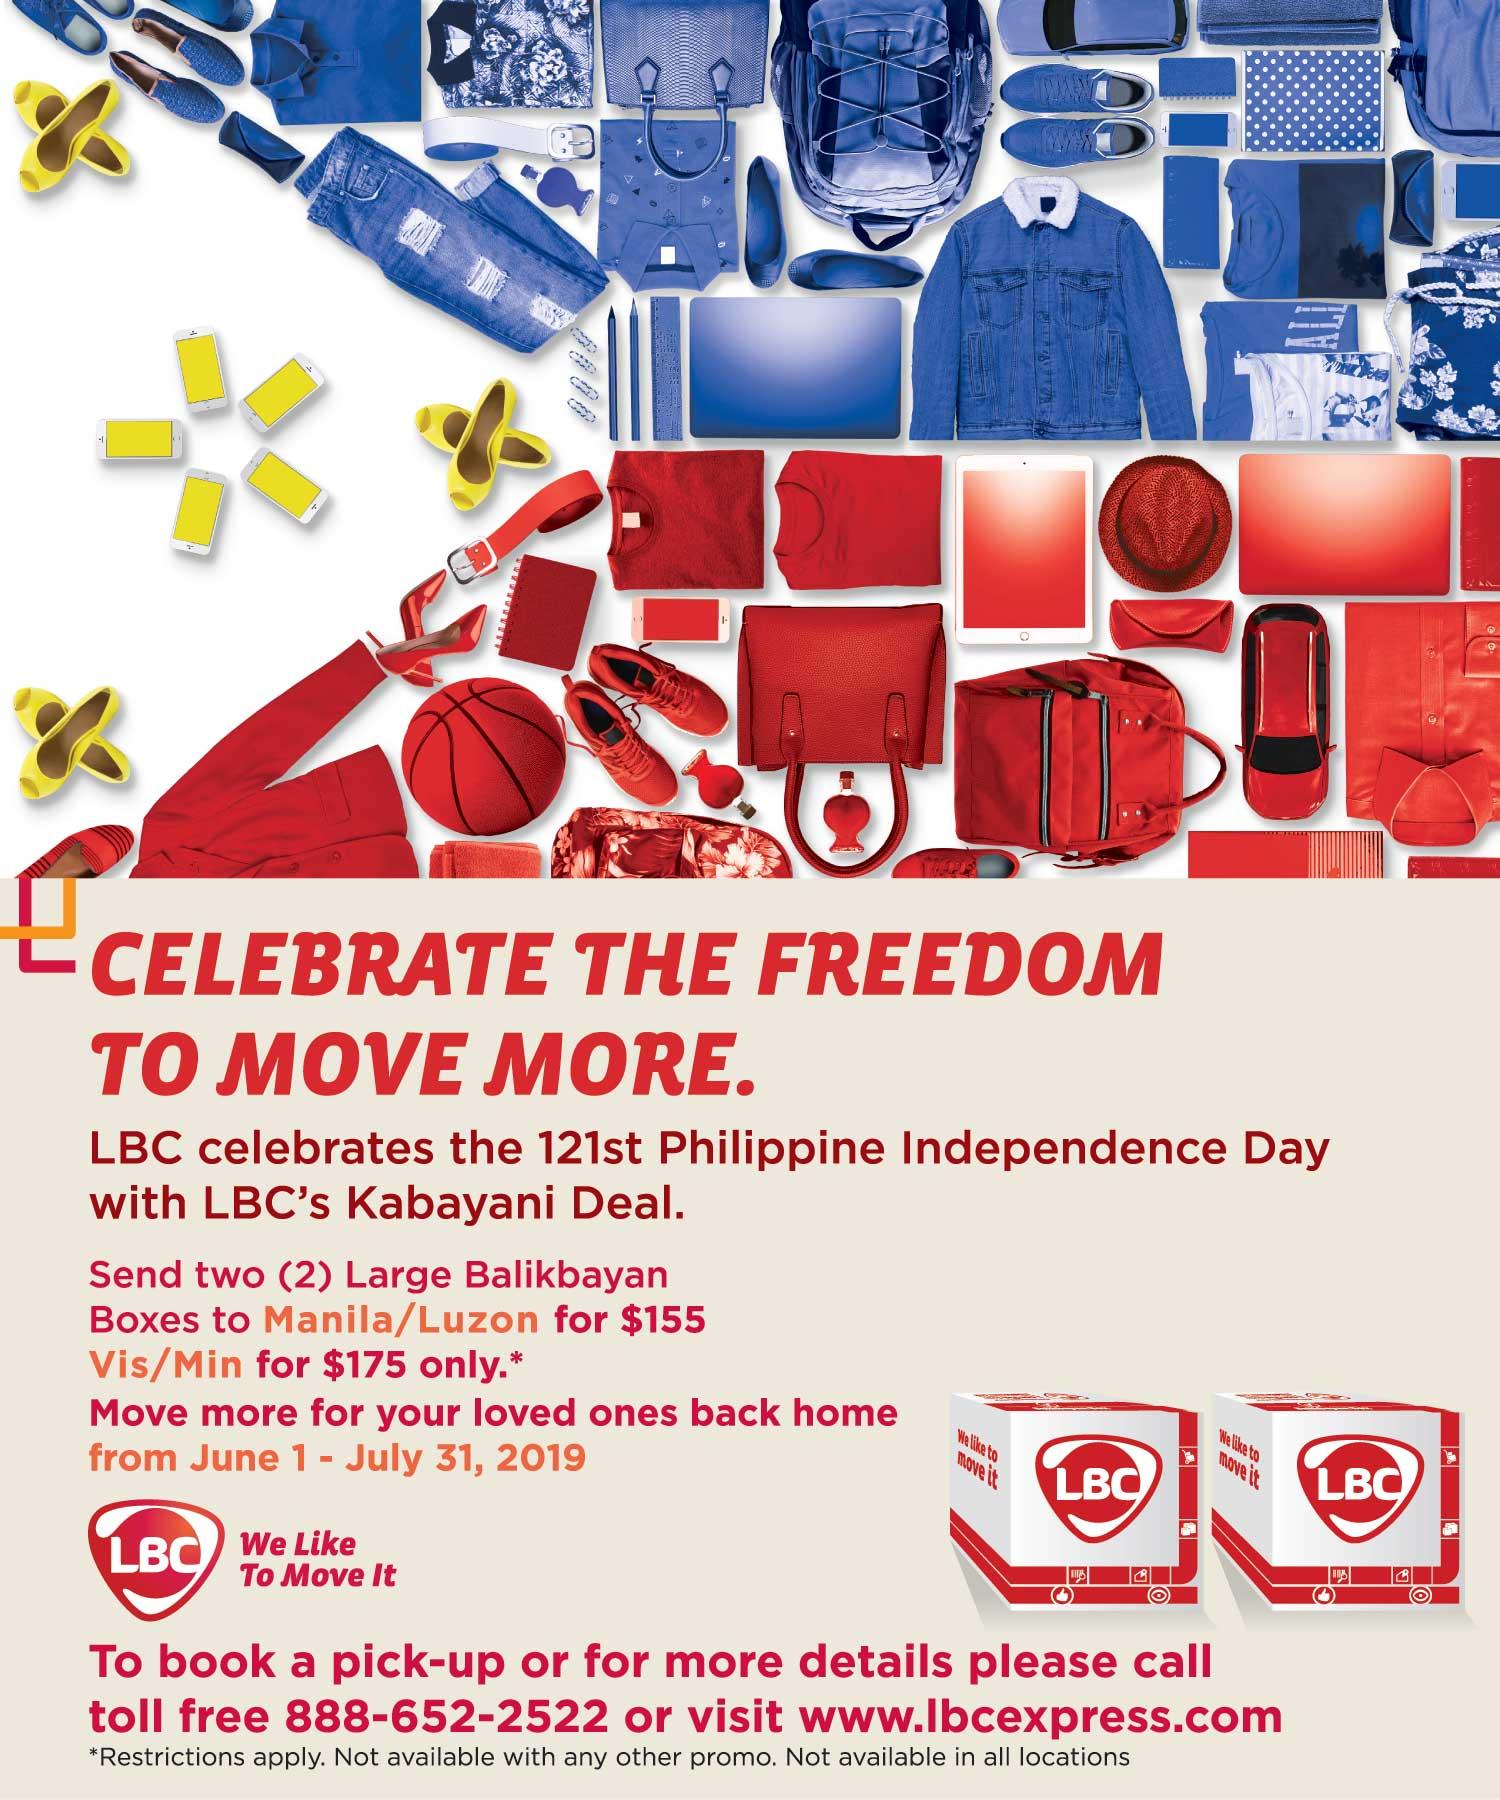 WESTERN CANADA – LBC Celebrates the 121st Philippine